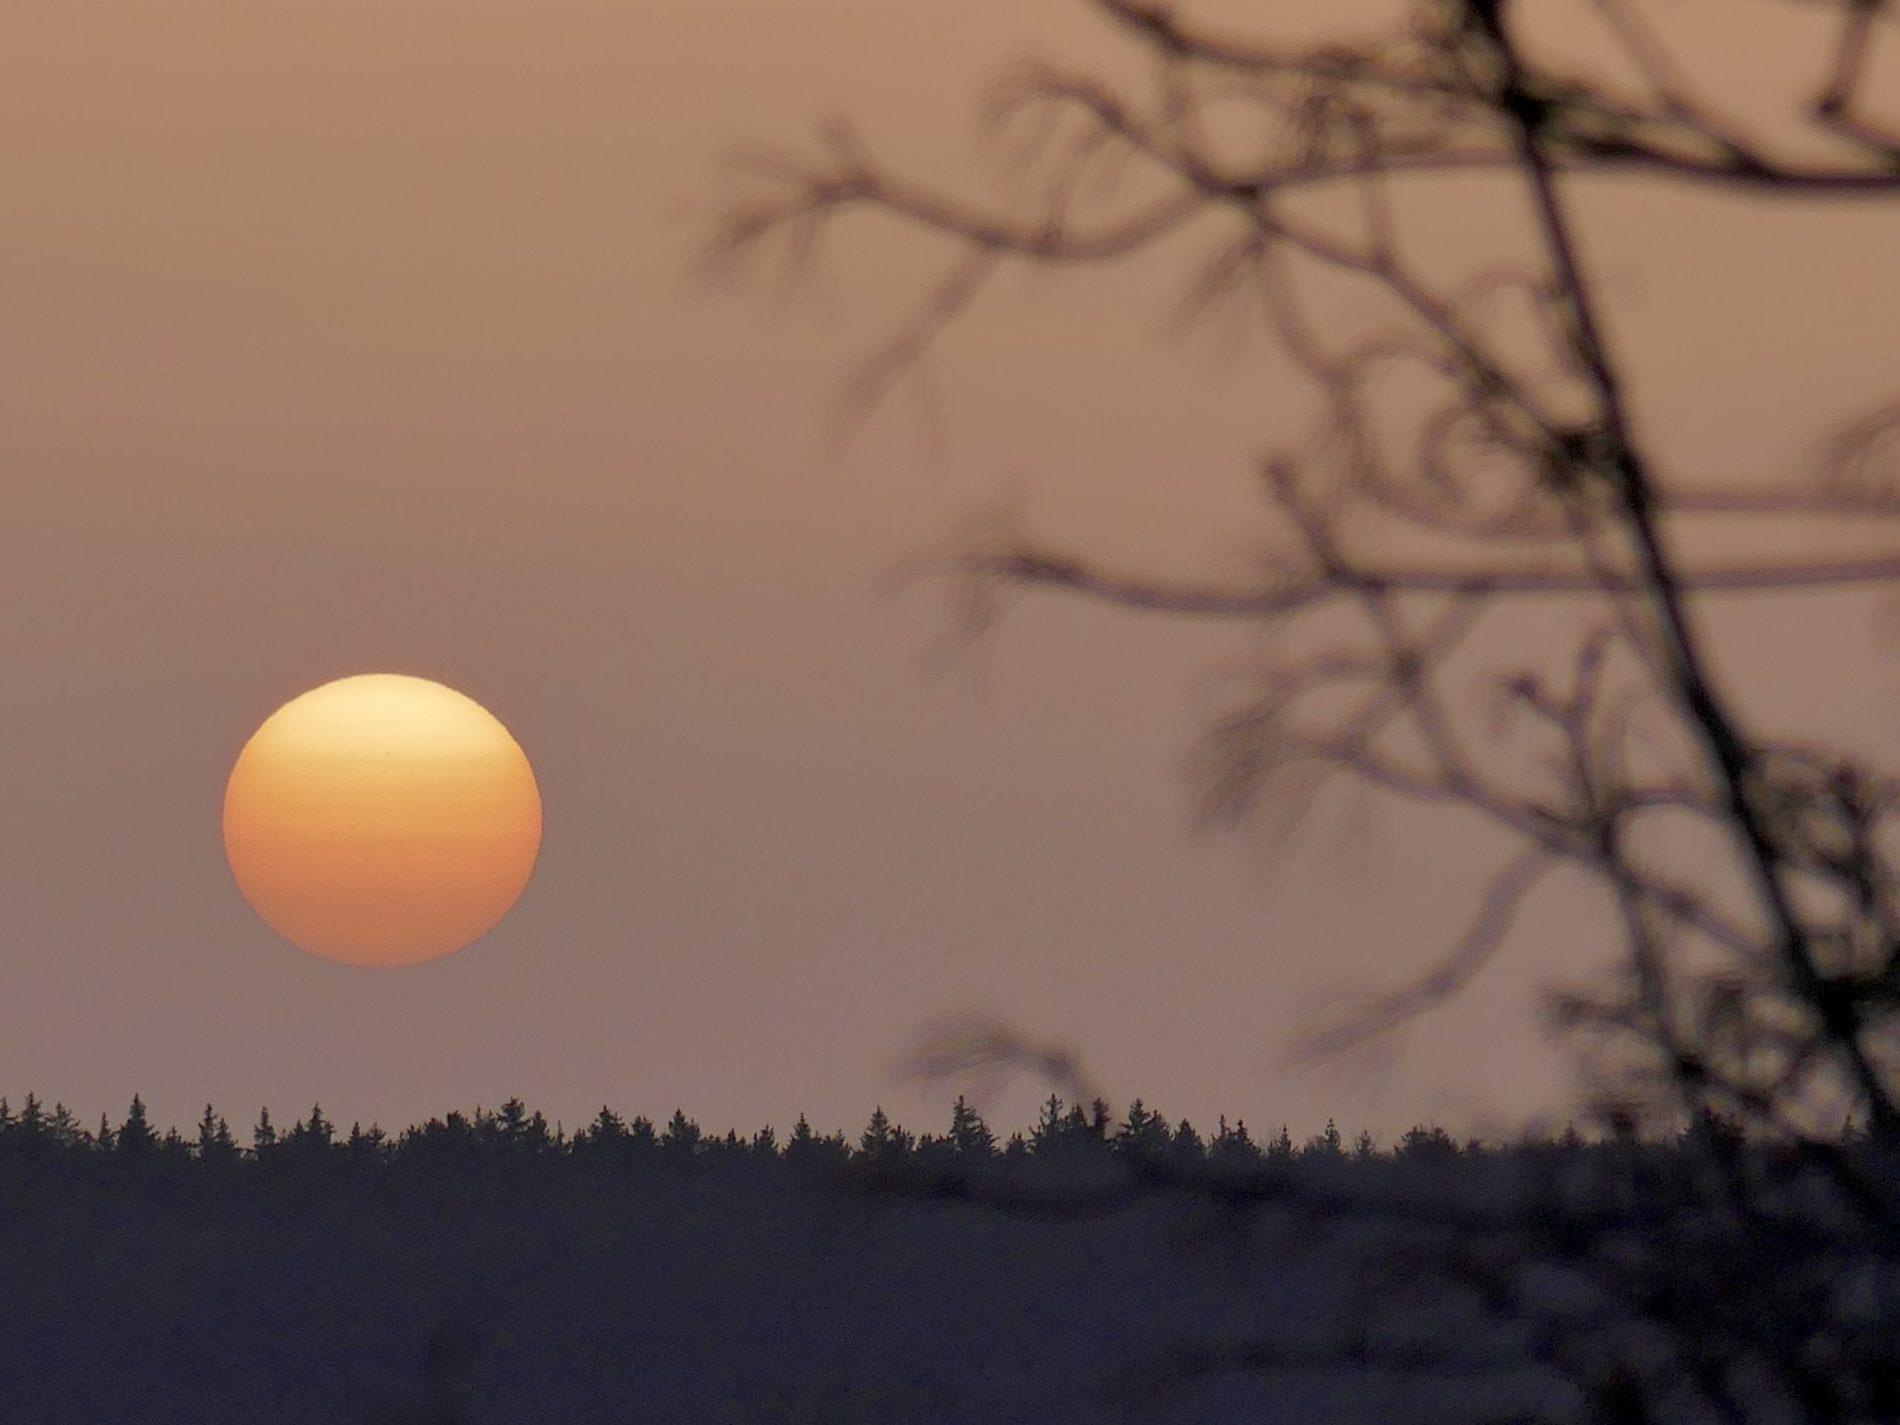 Sonnenaufgang mit Saharastaub_Lauchheim